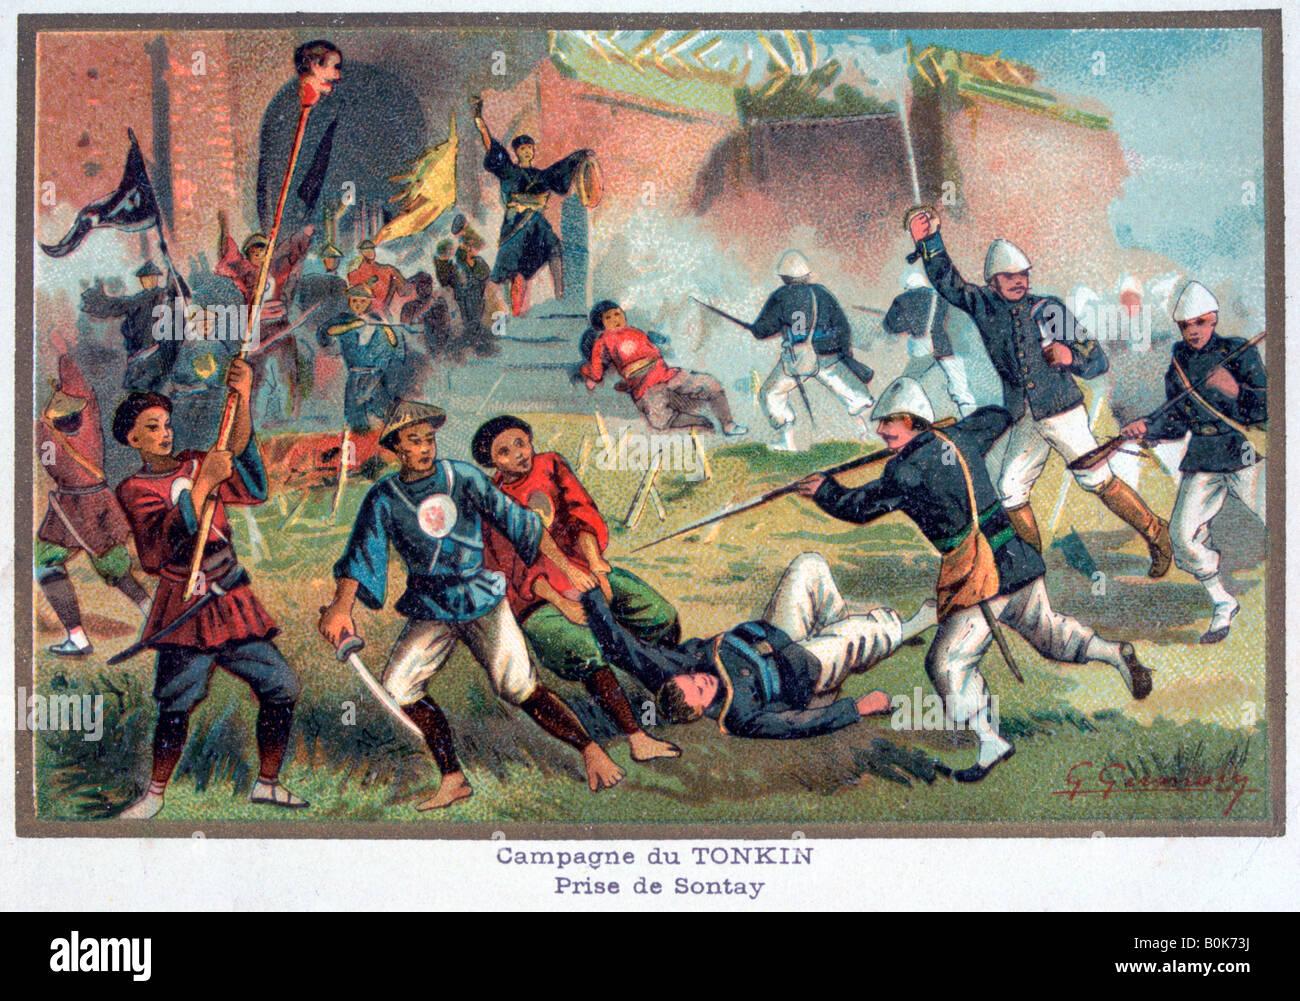 Battle of Tonkin, Franco-Chinese War, 20th century. Artist: Unknown Stock Photo